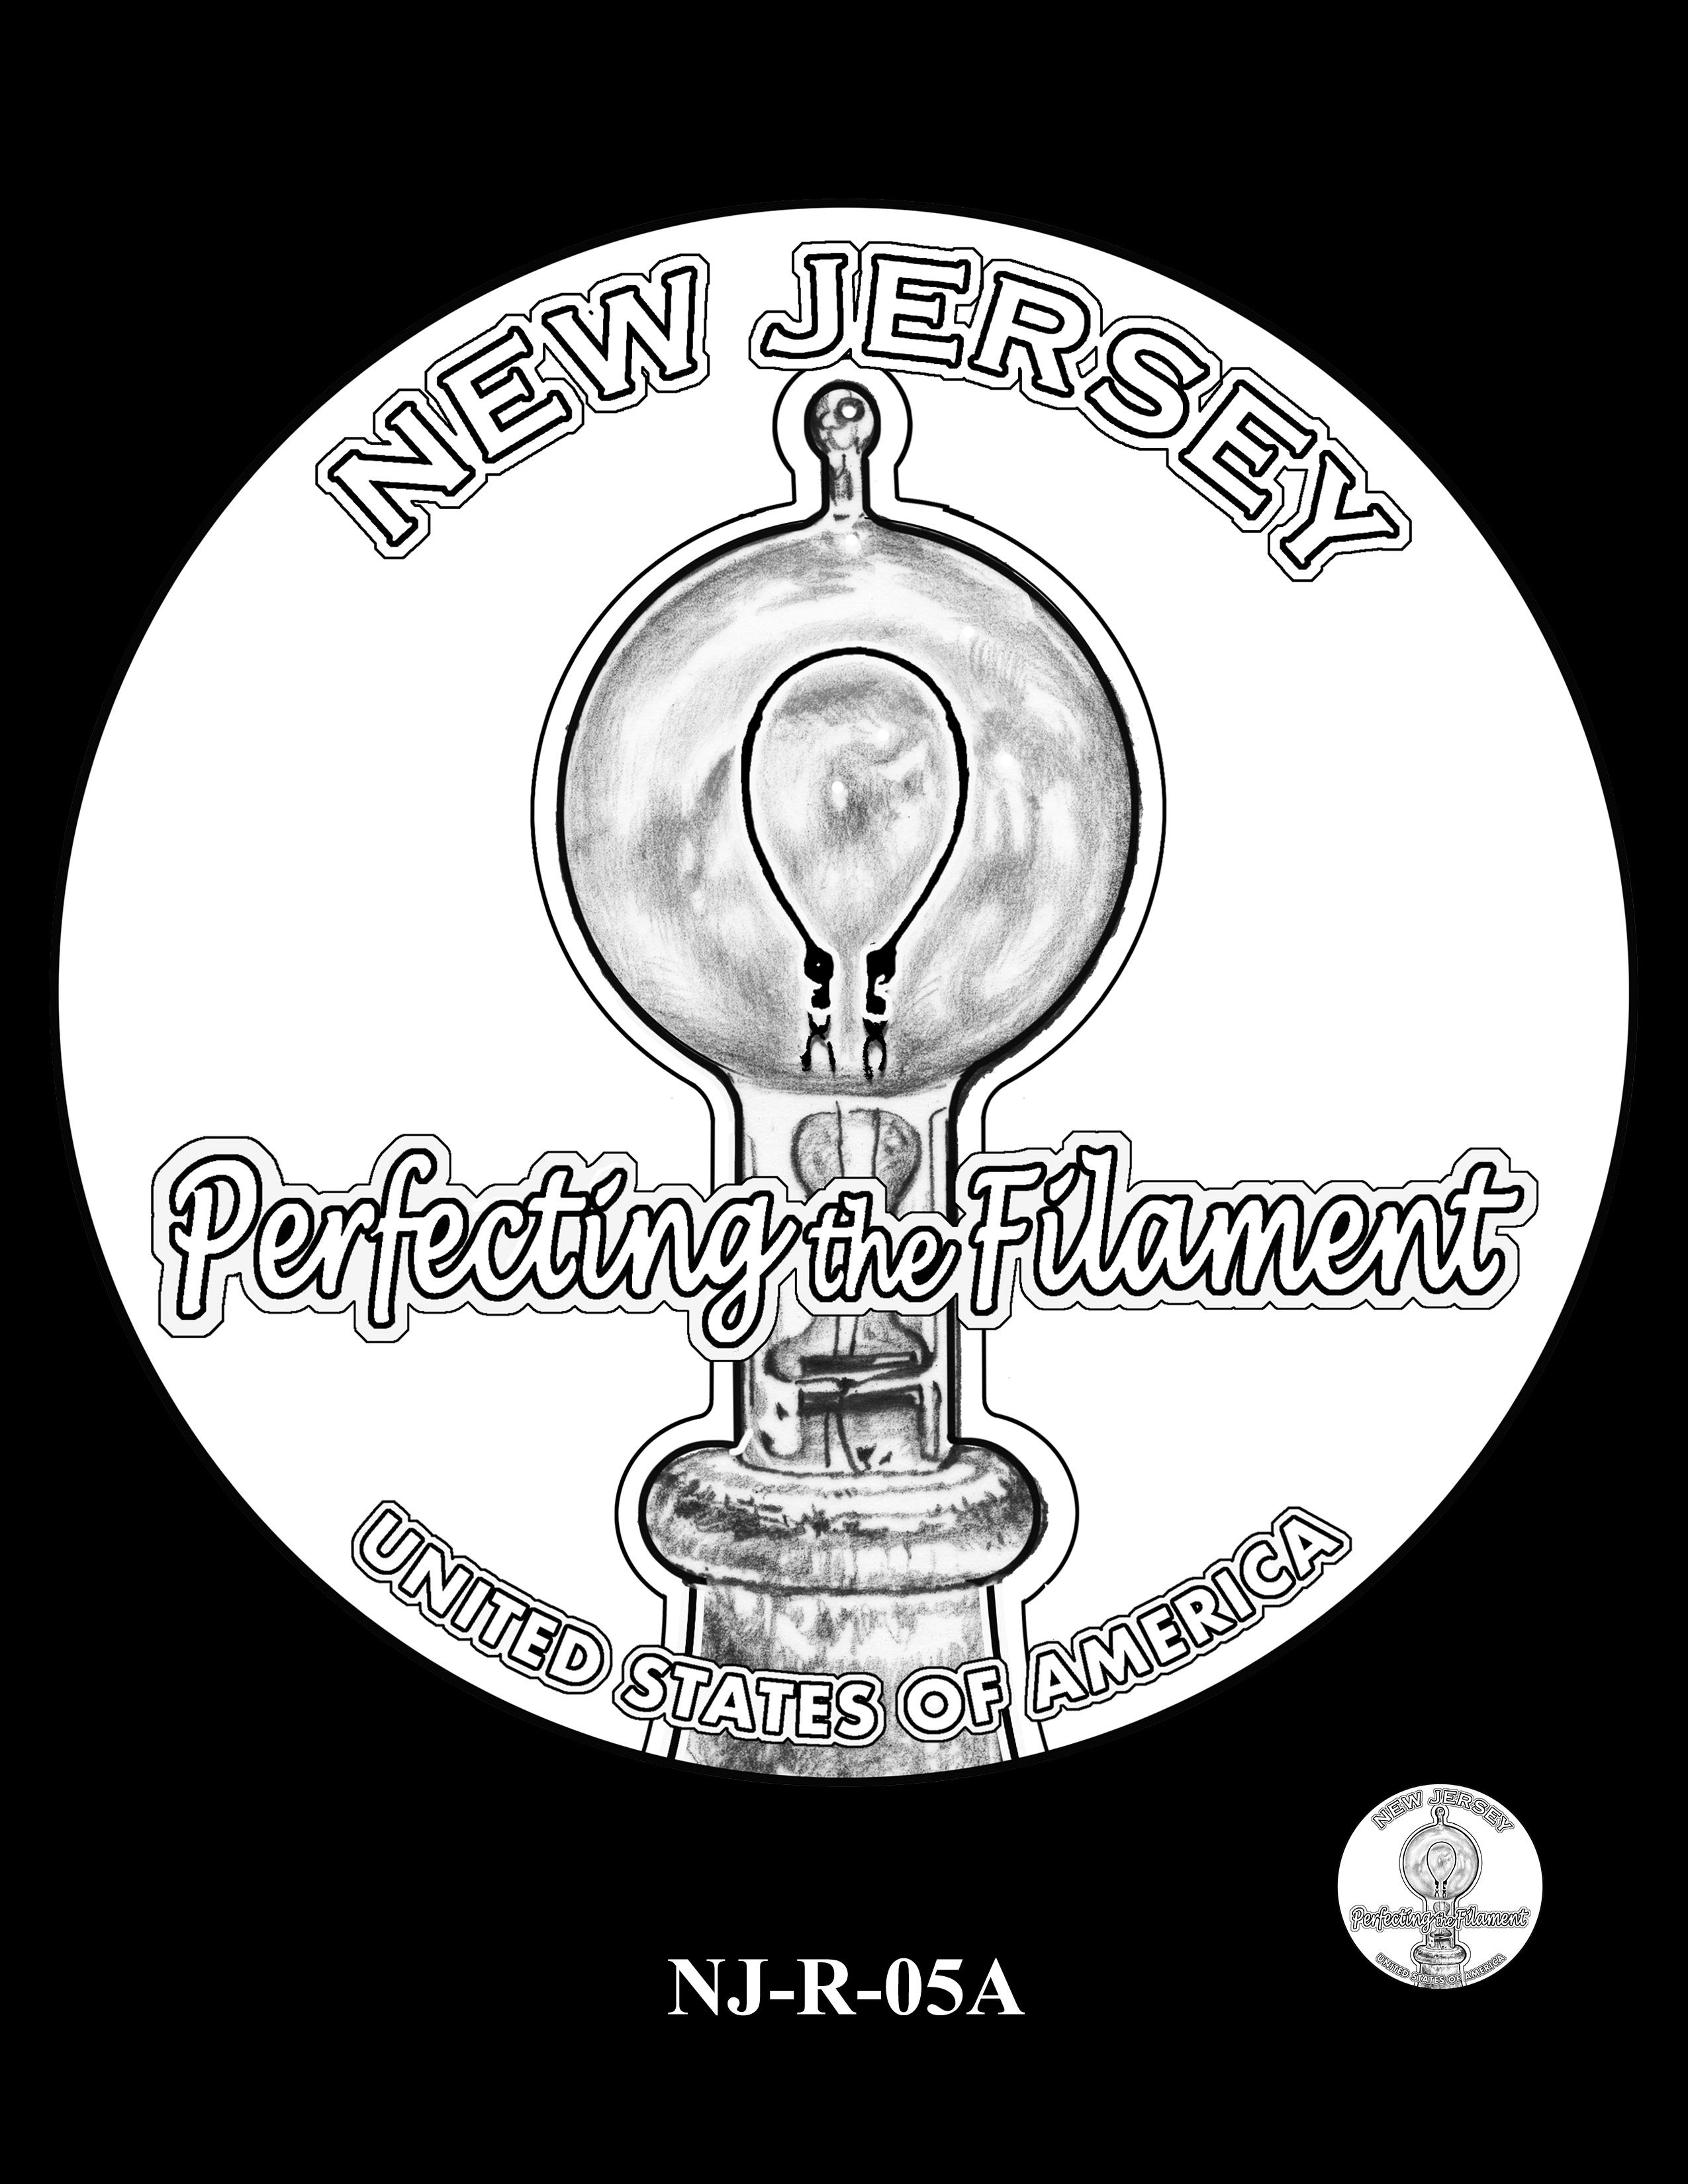 NJ-R-05A -- 2019 American Innovation $1 Coin Program